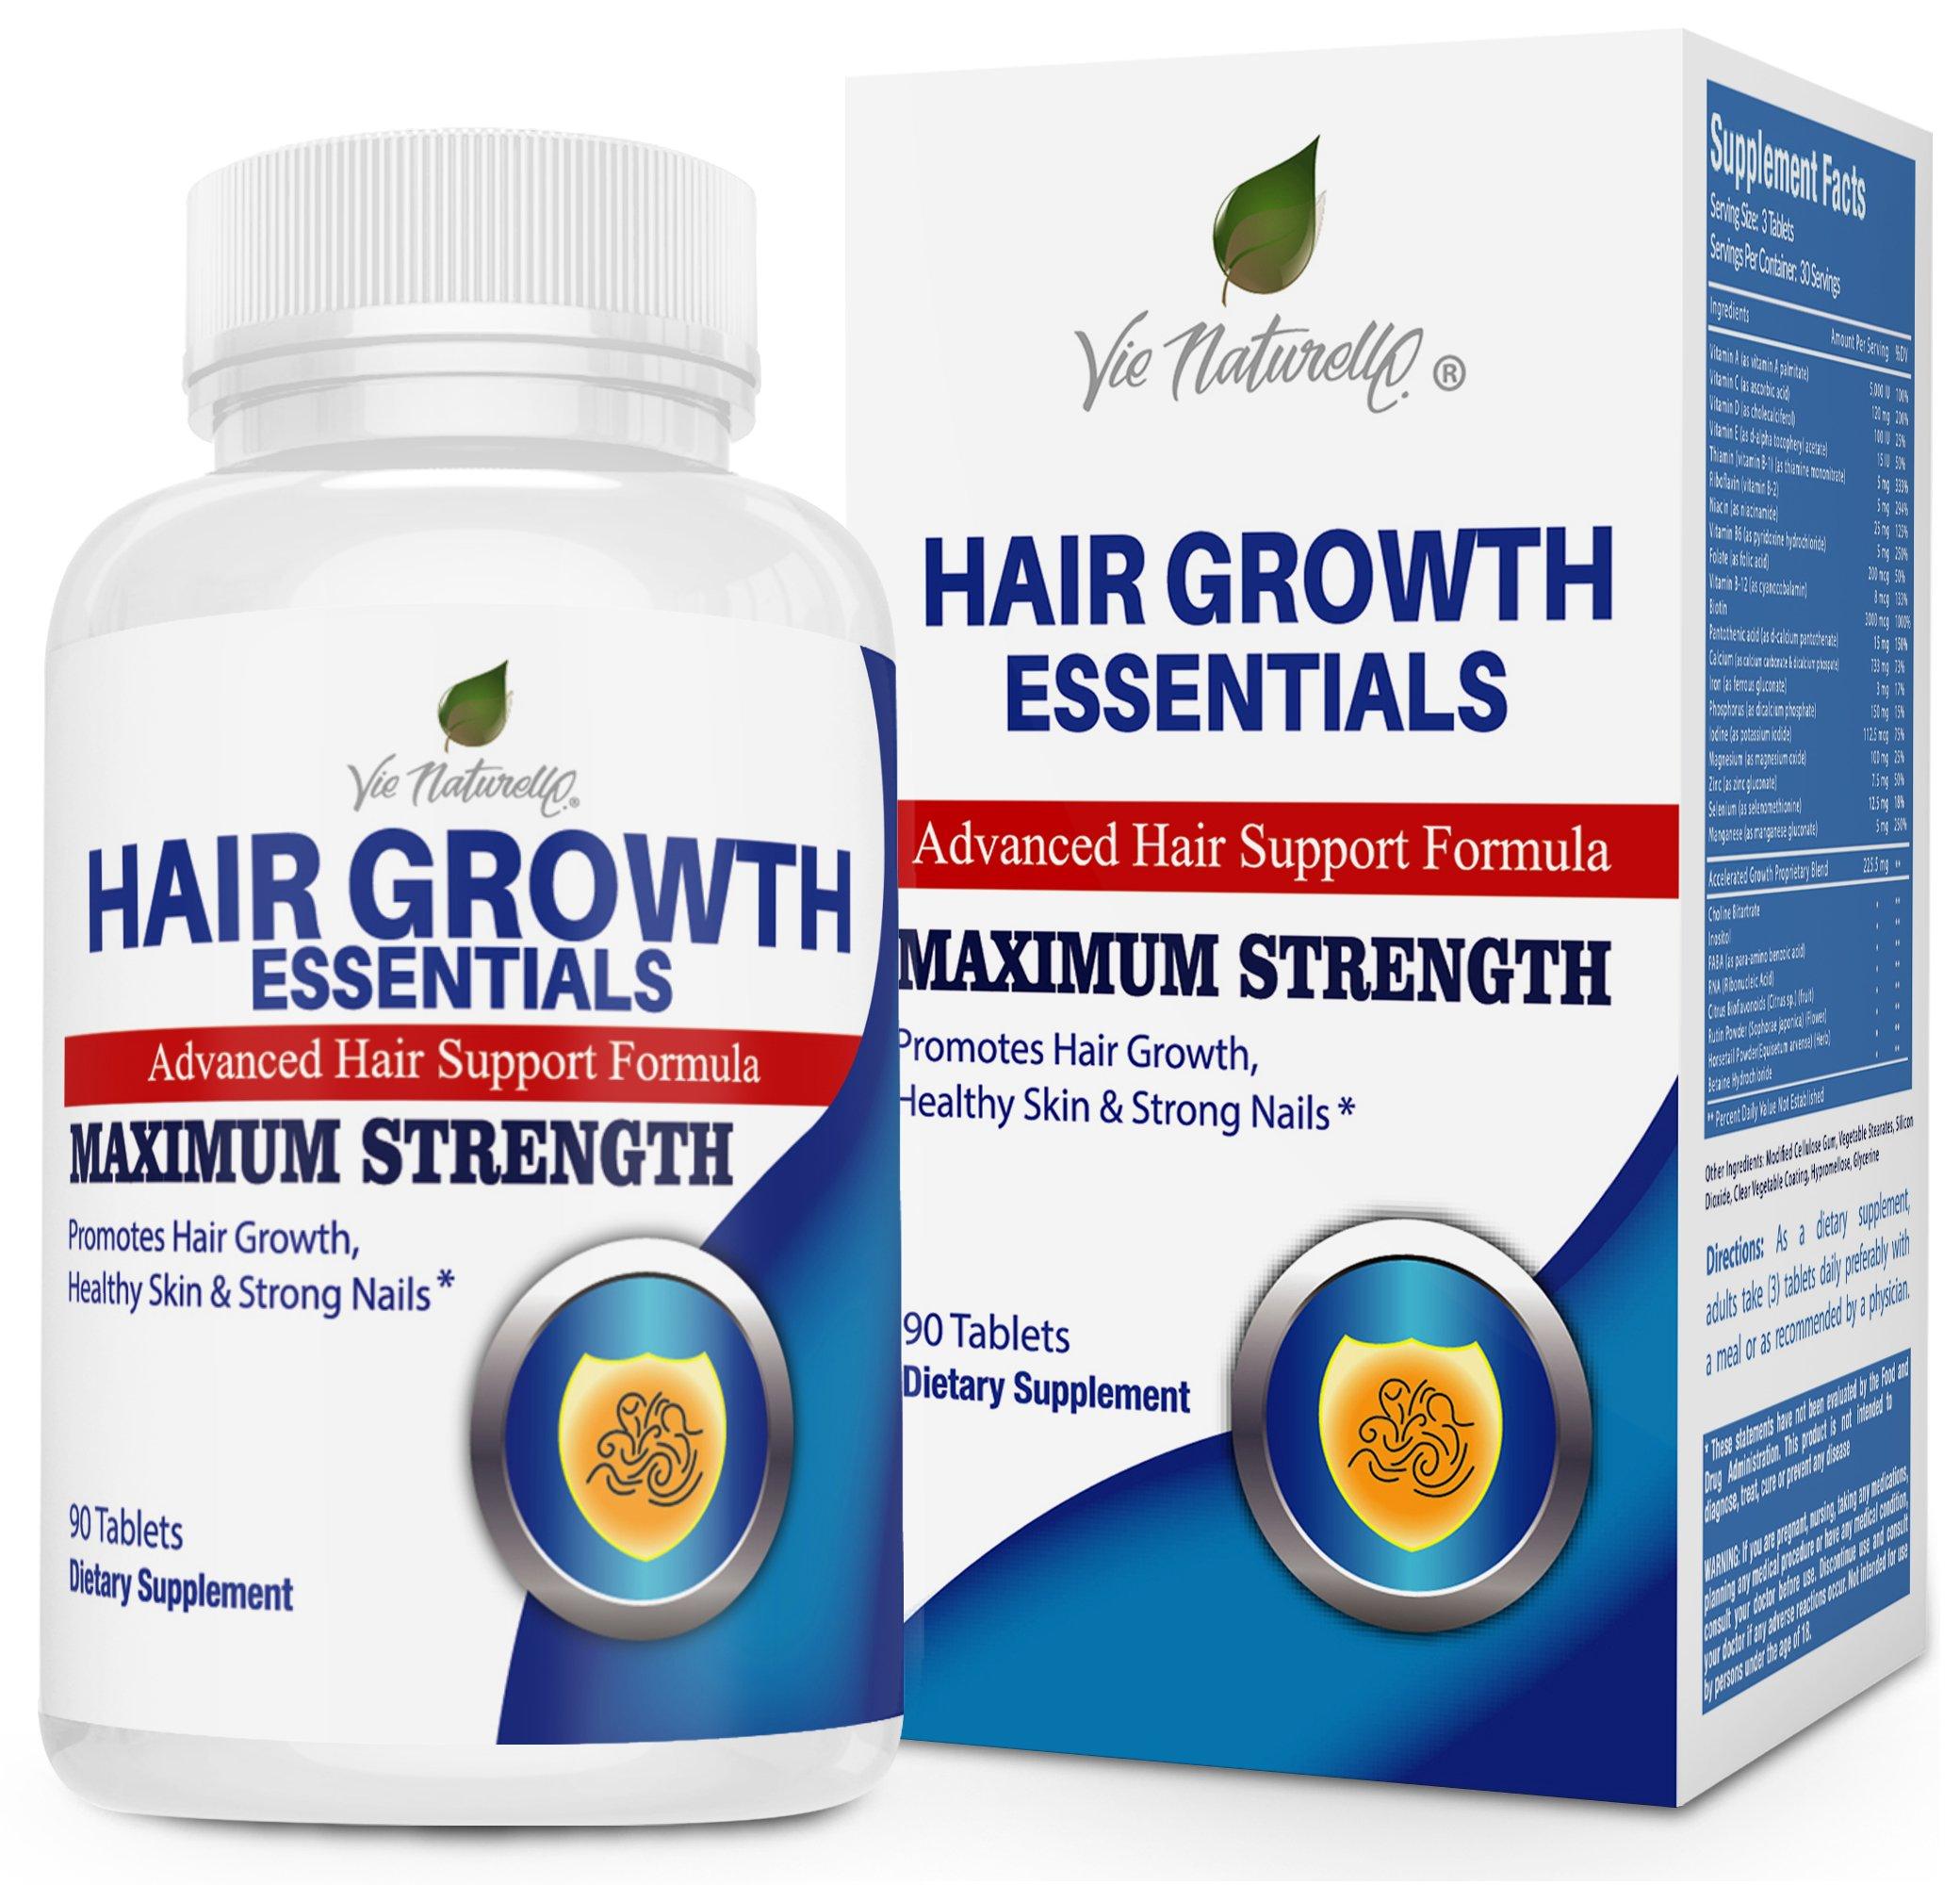 Hair Growth Essentials Pills Supplement - 29 Hair Regrowth Nutrients - Hair Loss Vitamins for Women & Men